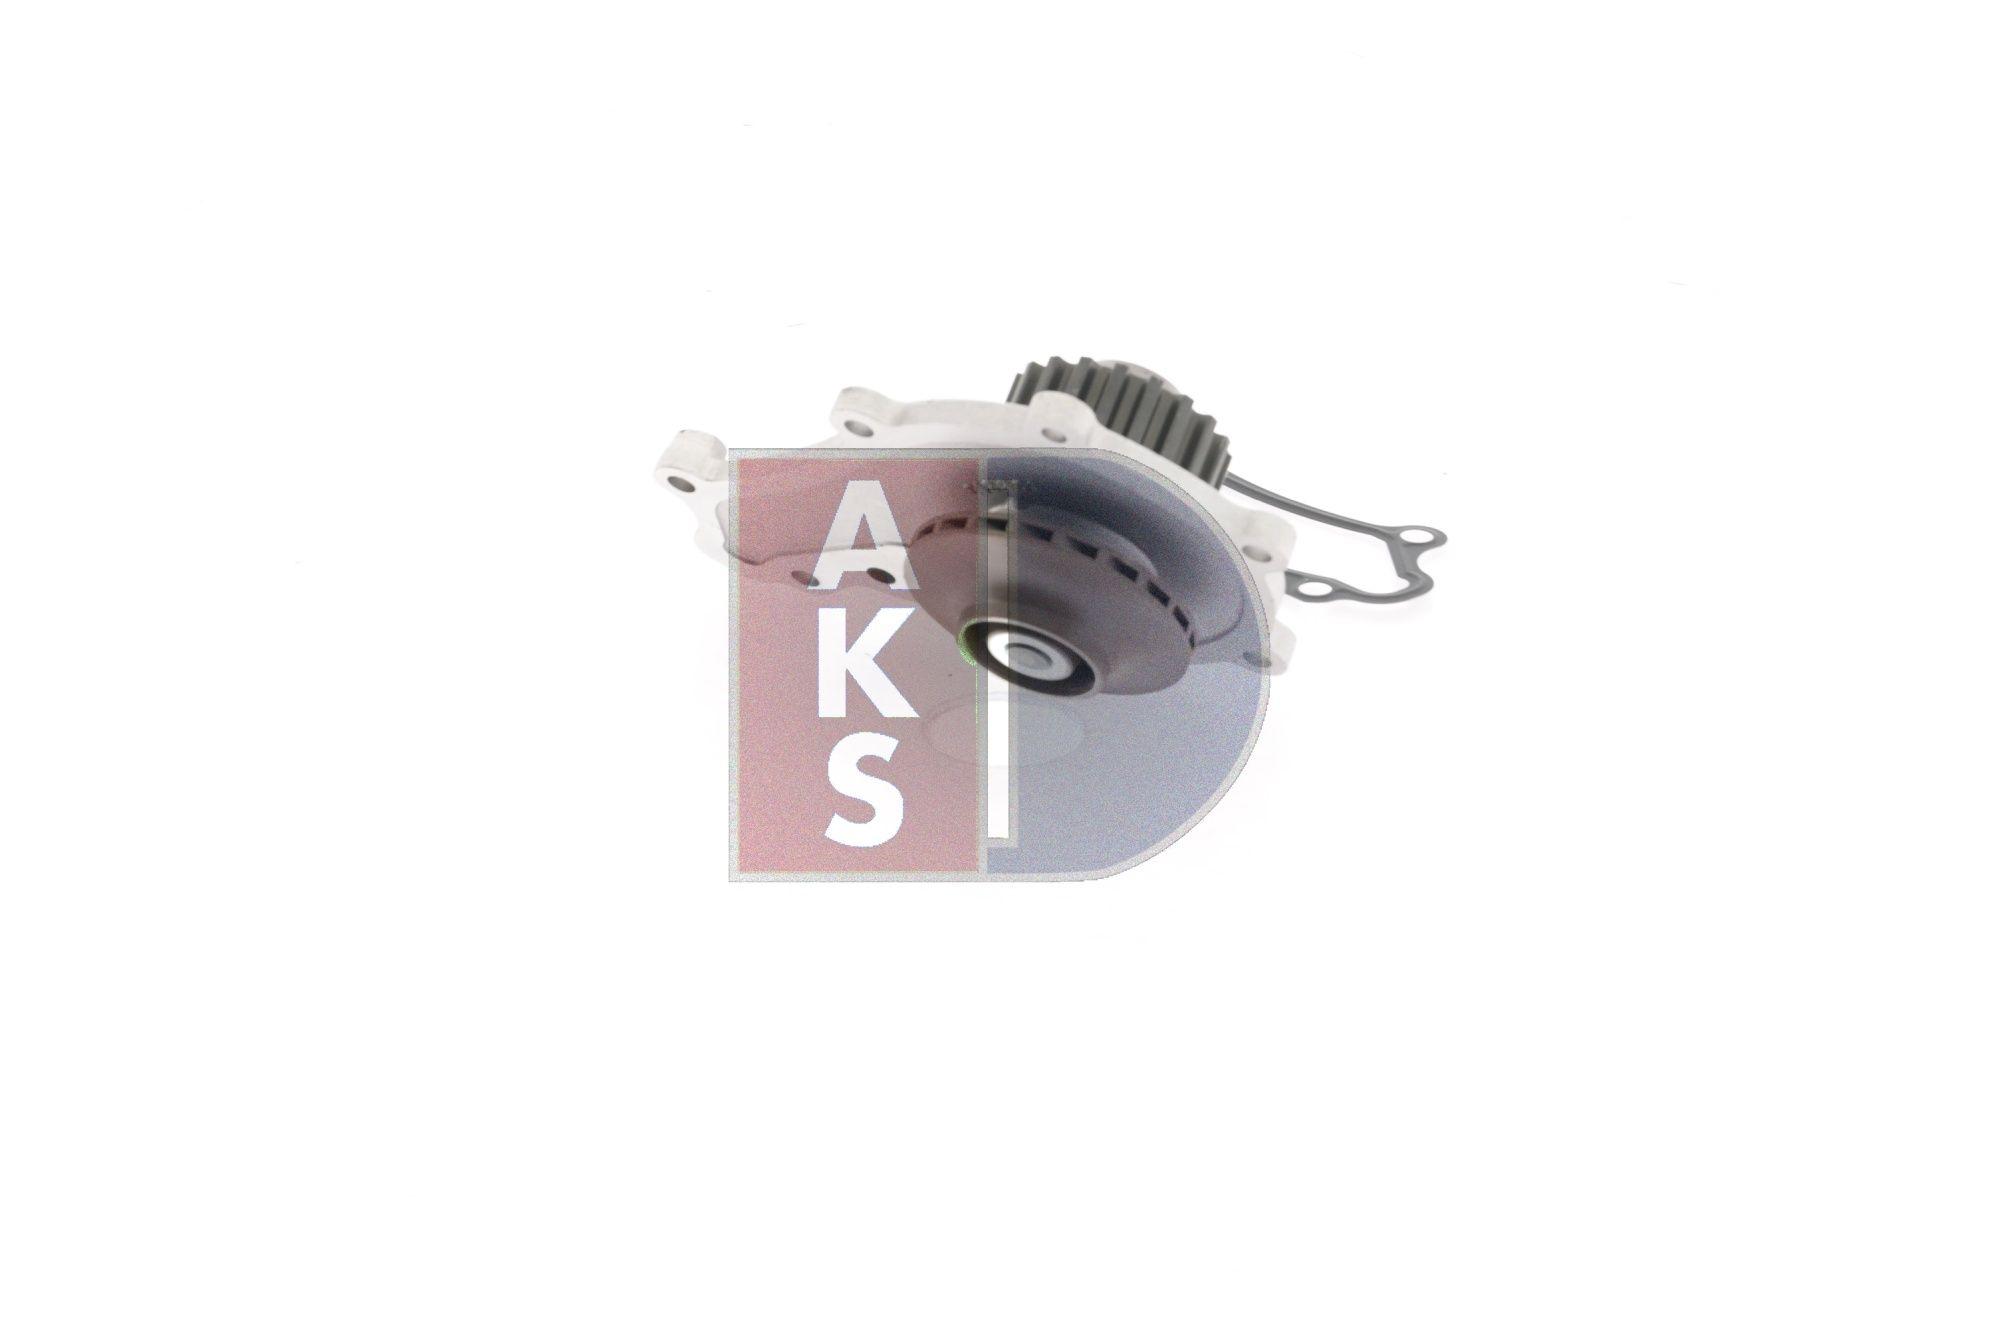 570127N Kühlwasserpumpe AKS DASIS - Markenprodukte billig